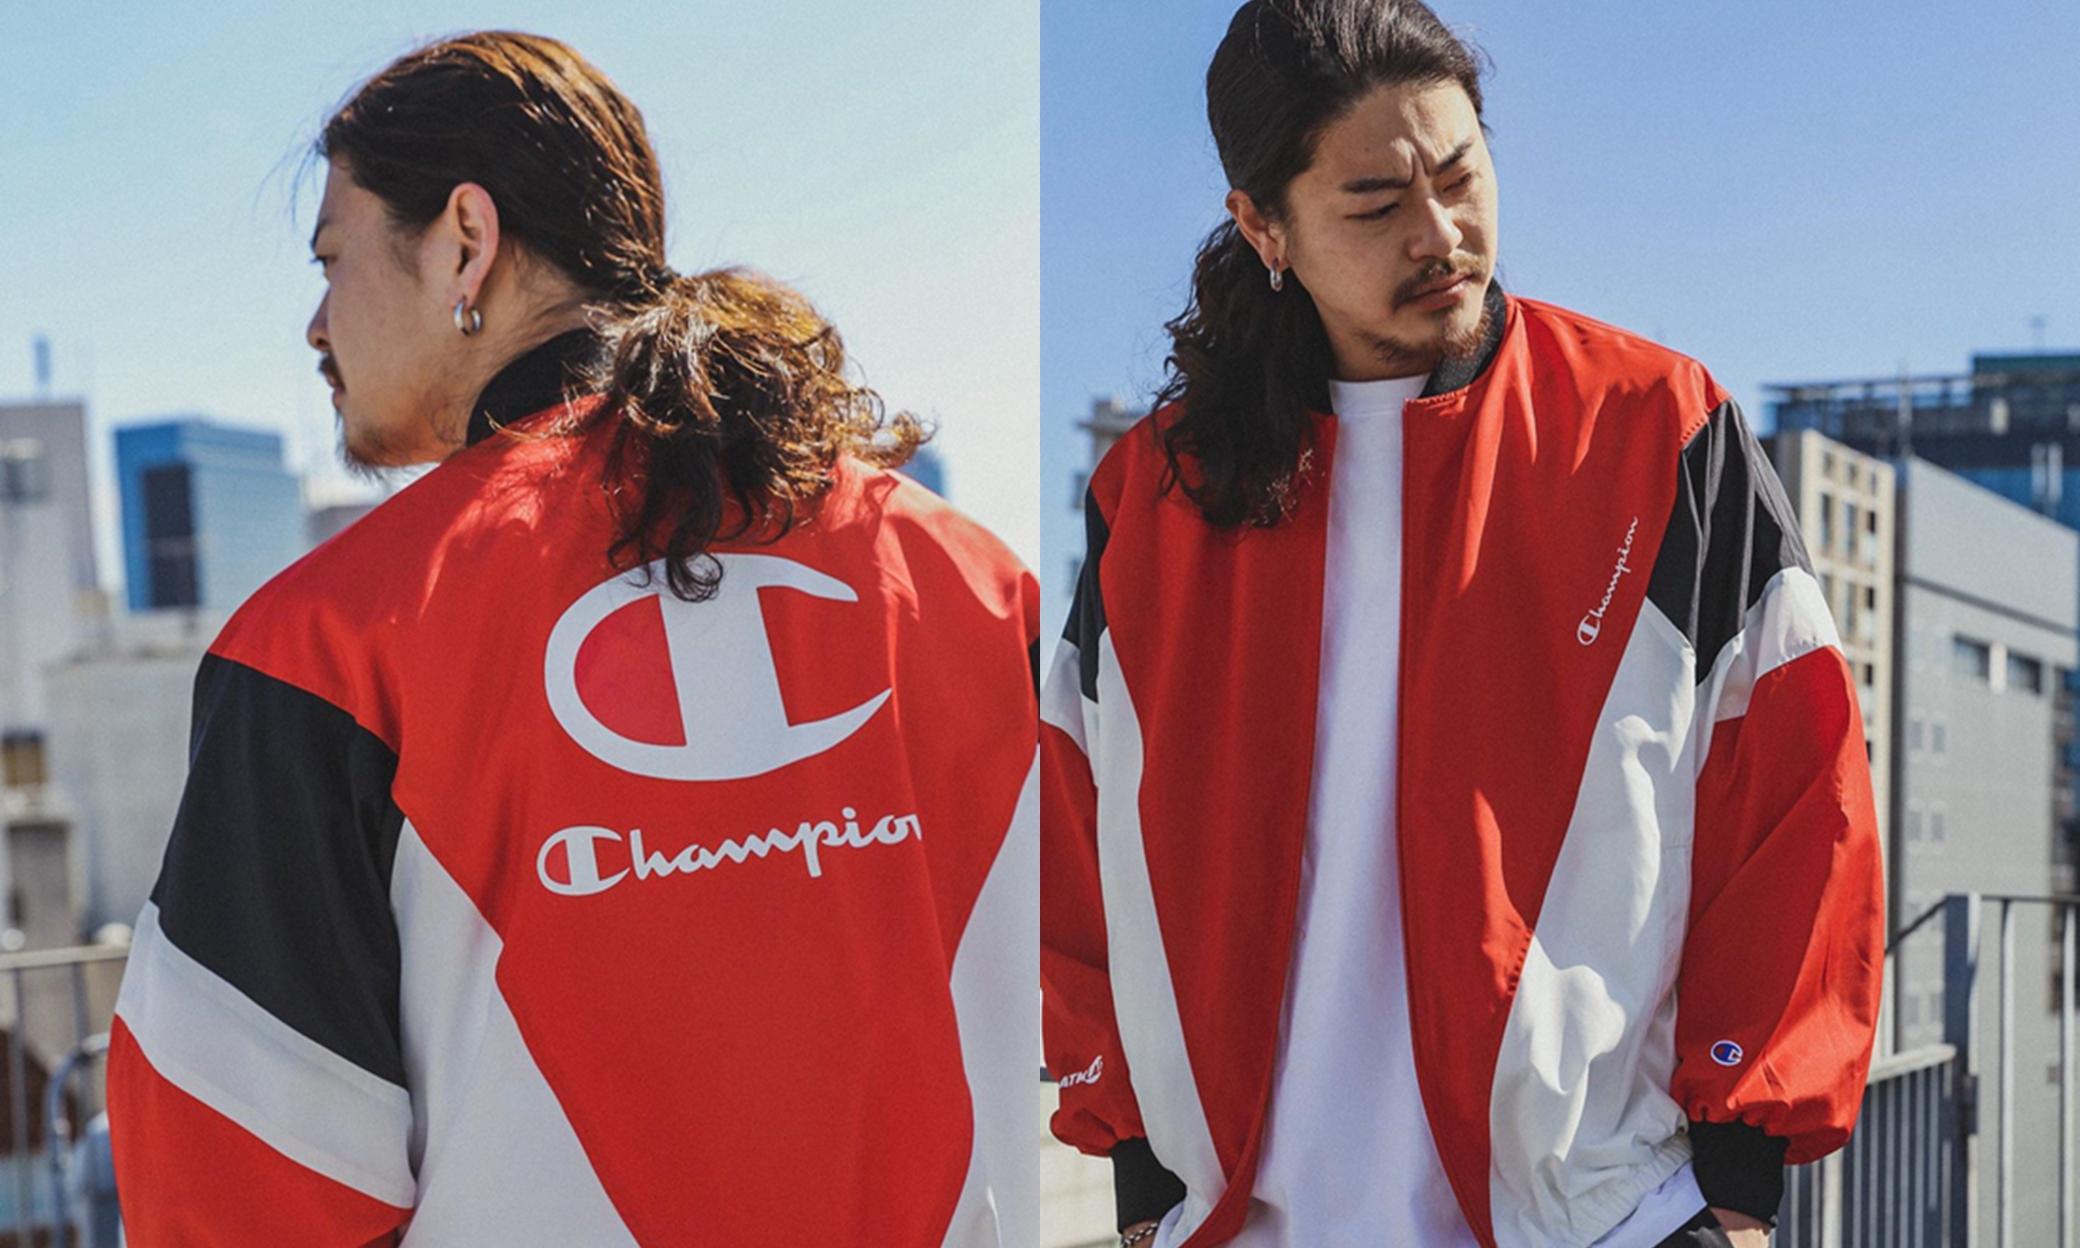 Champion x ATMOS LAB 全新合作系列正式发布